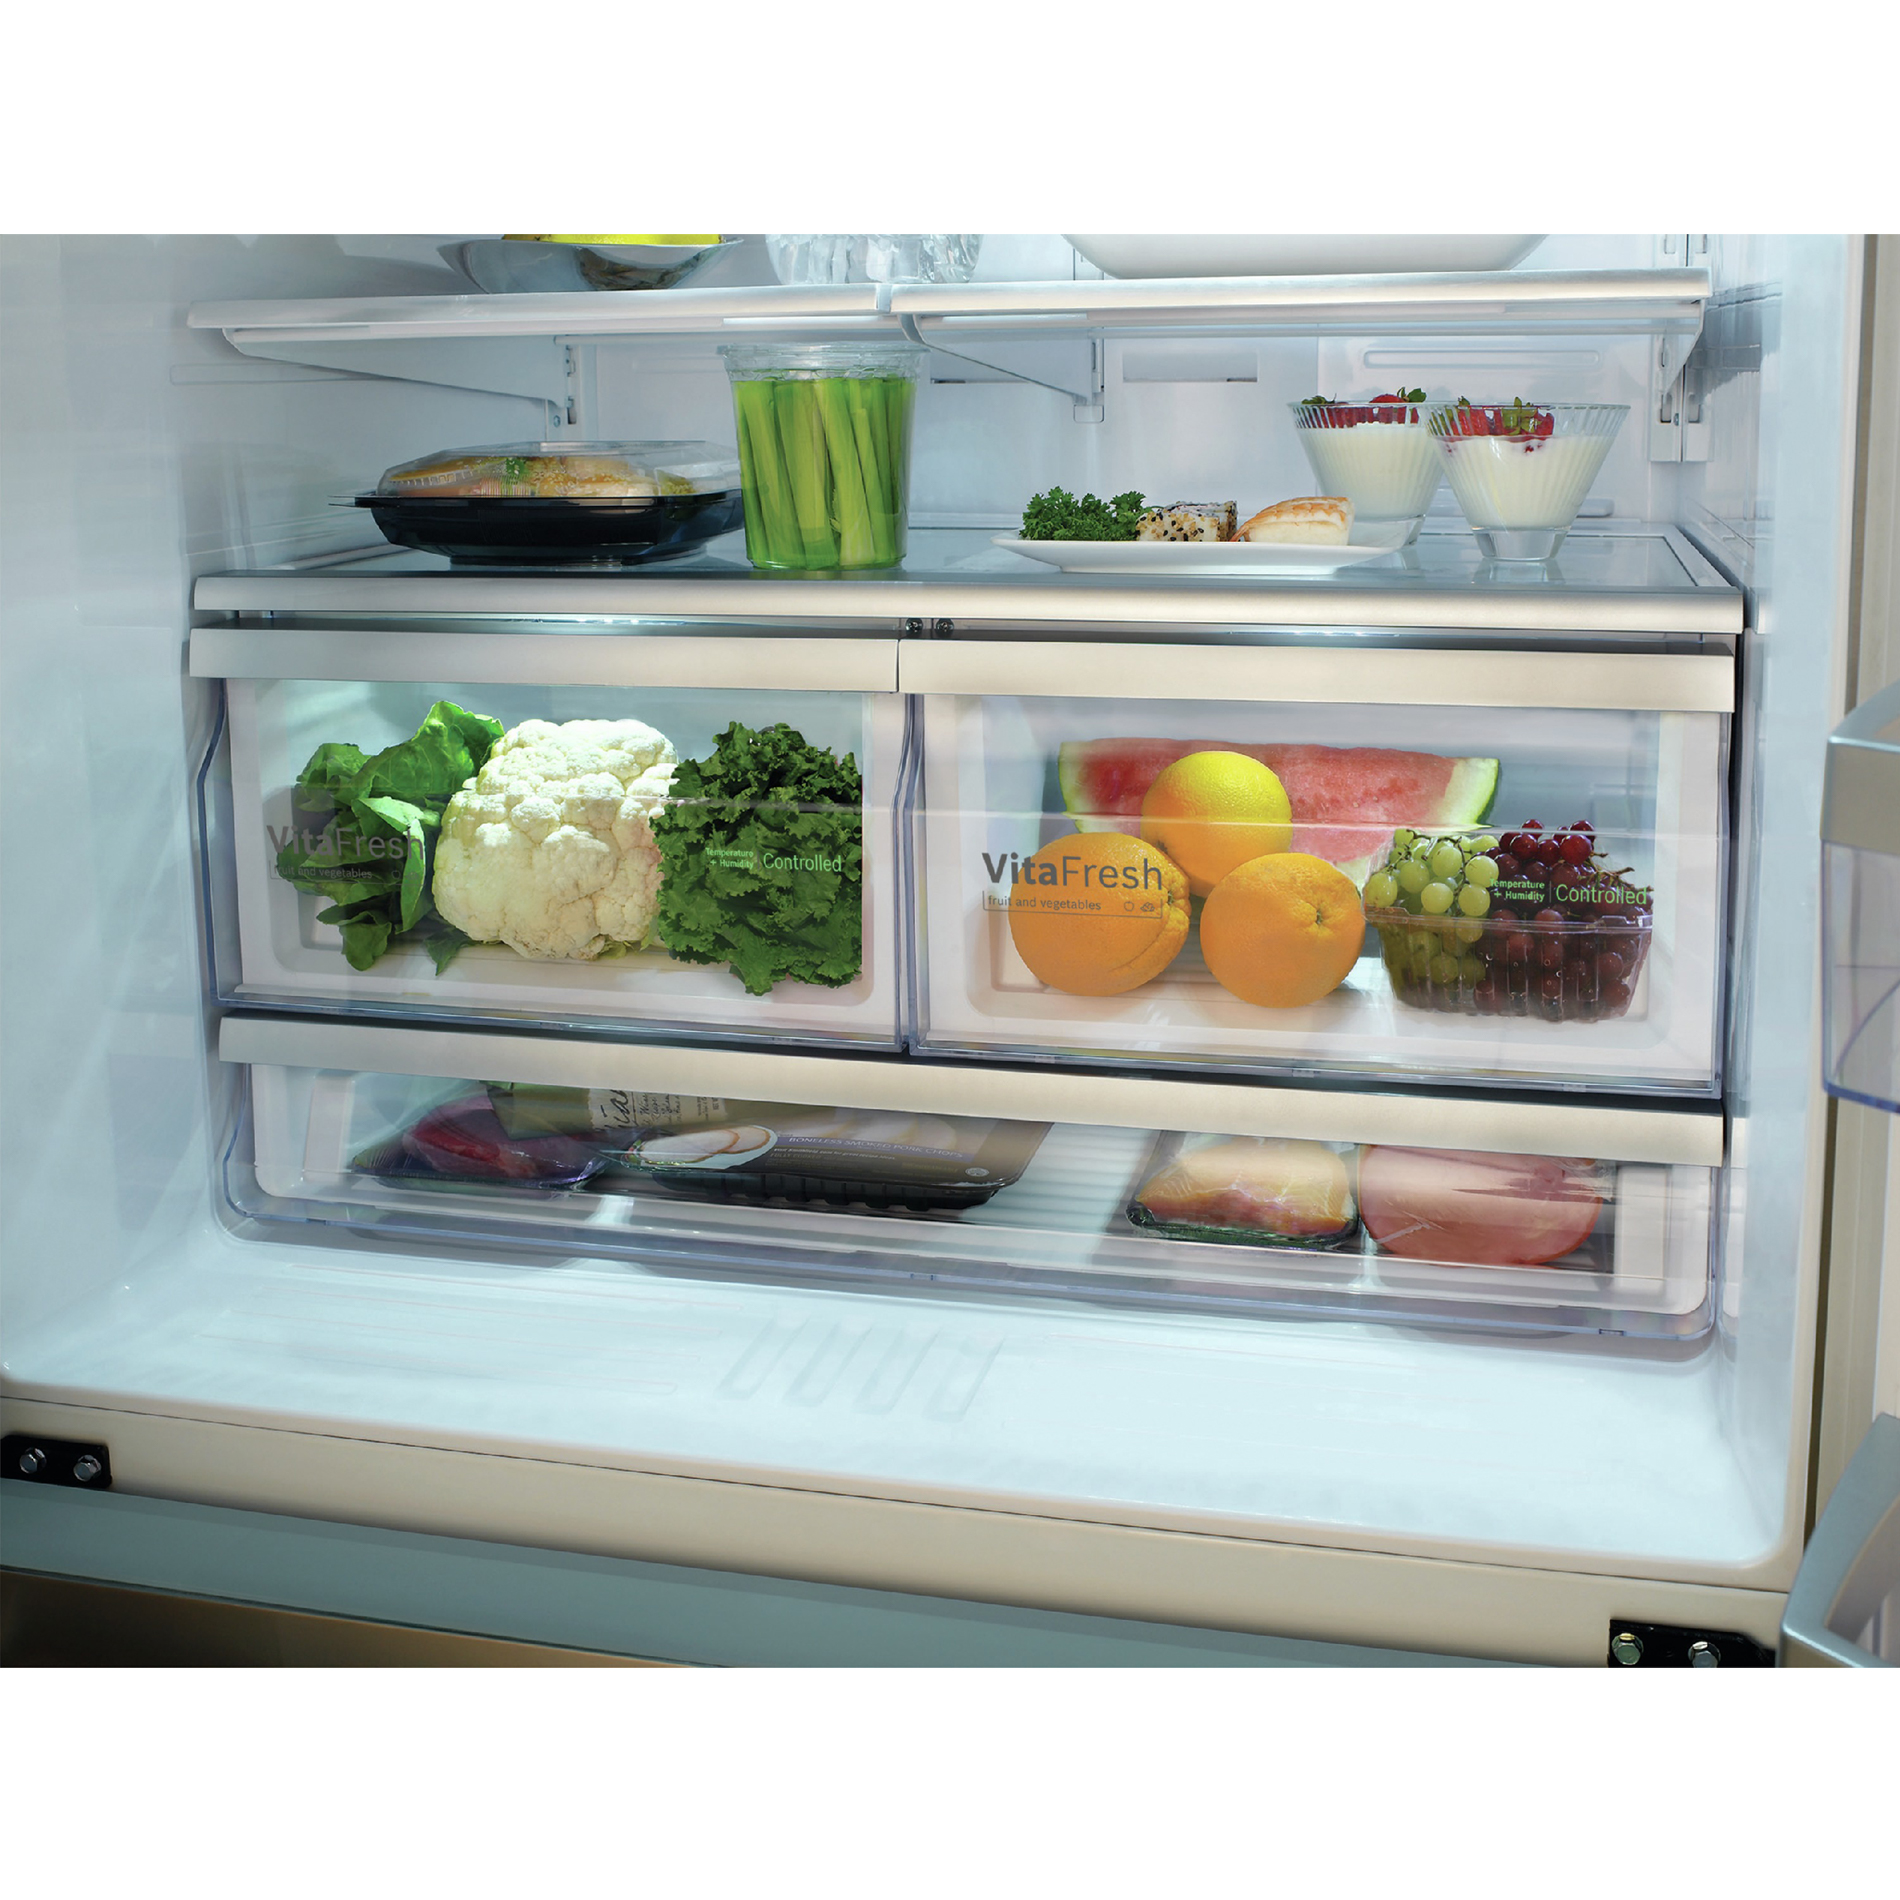 Bosch B26FT80SNS 800 Series 25.5 cu. ft.  French Door Bottom-Freezer Refrigerator - Stainless Steel